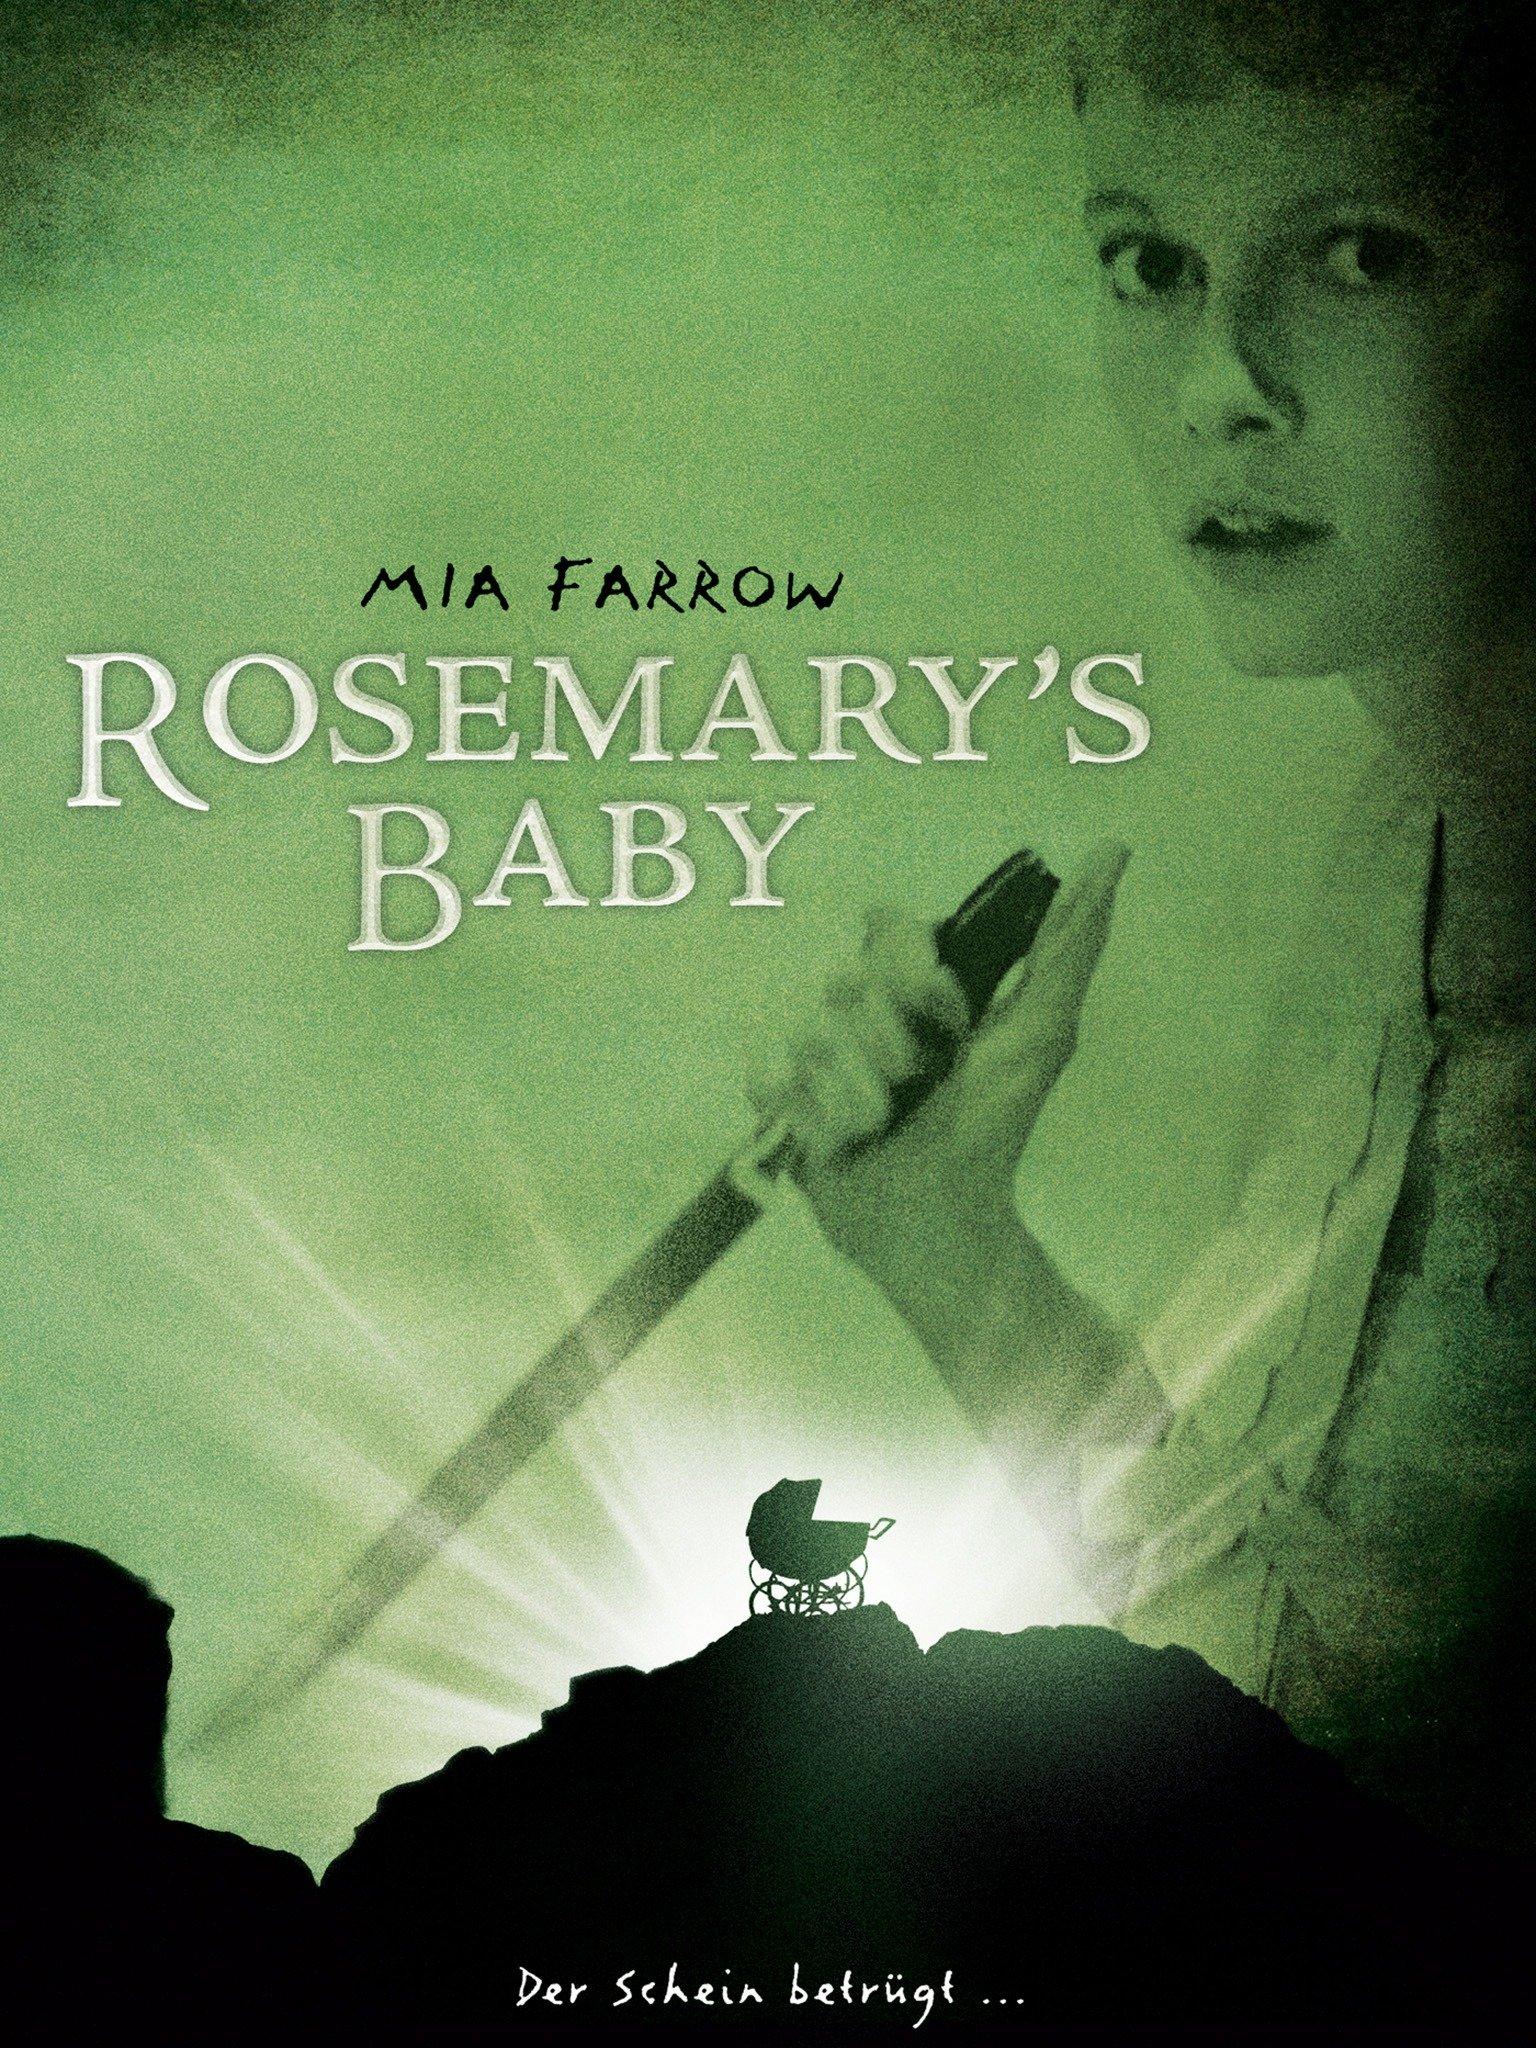 Rosemary's Baby - Movie Reviews